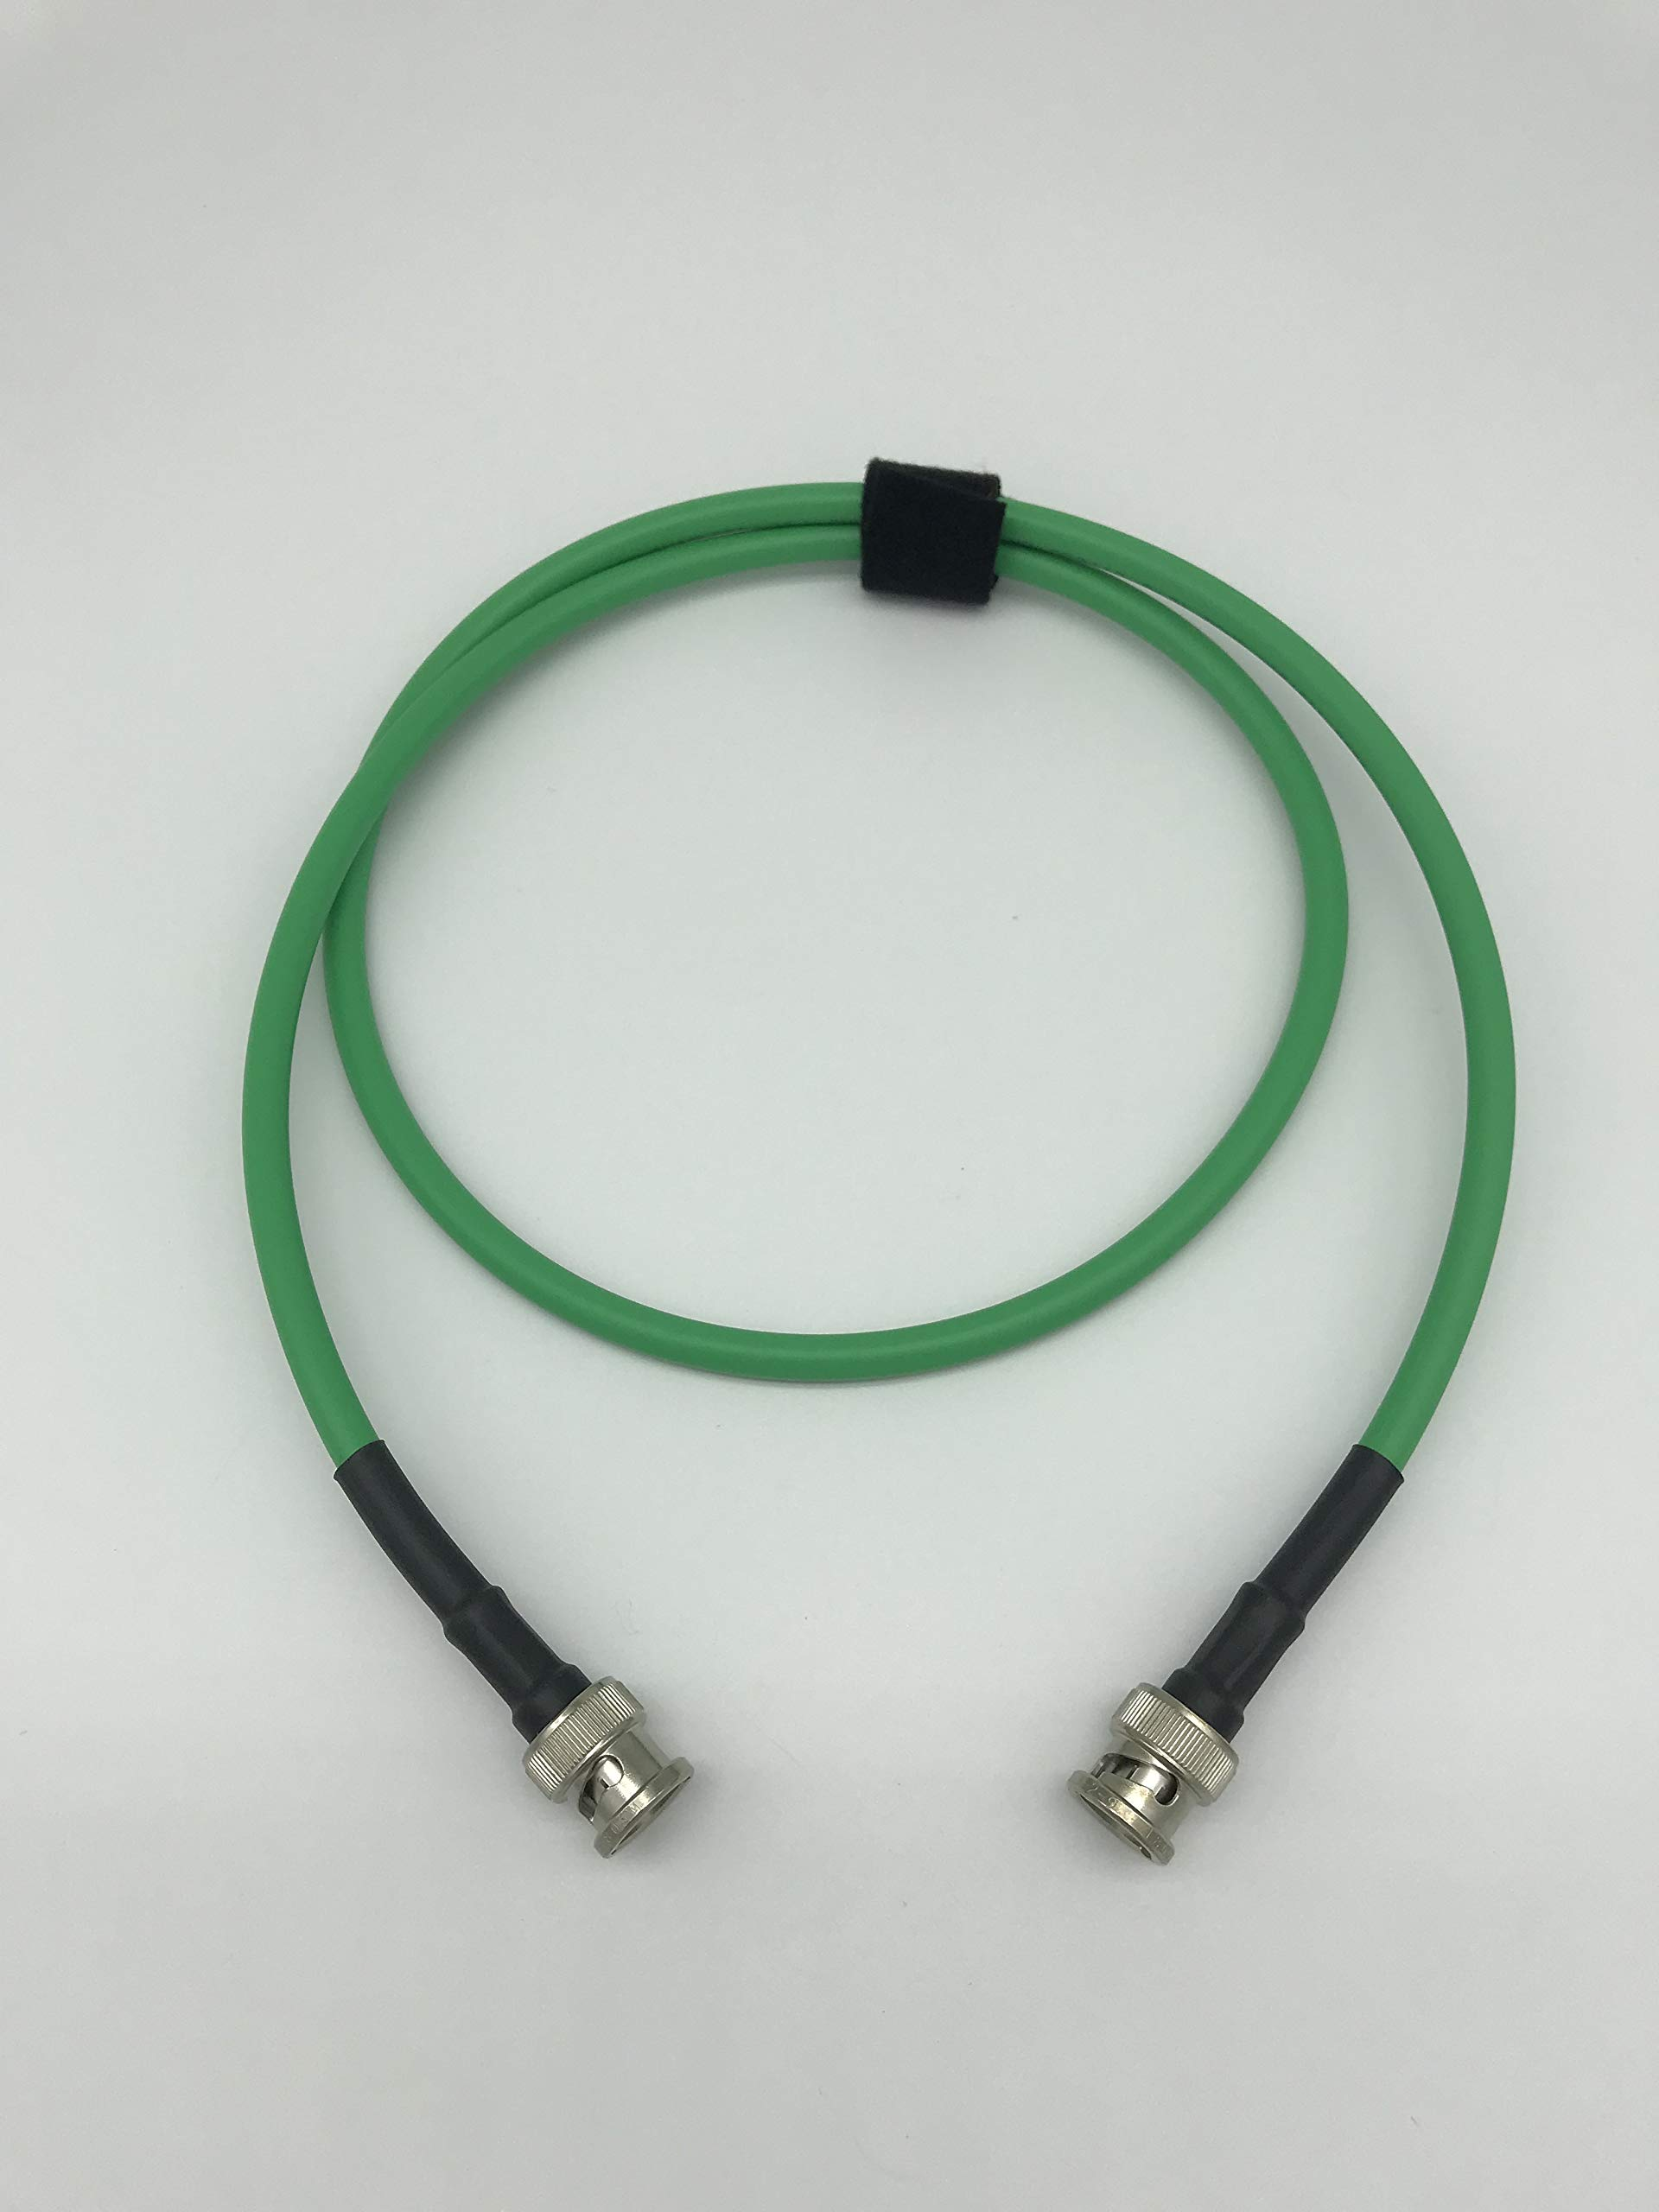 AV-Cables 3G/6G HD SDI BNC RG59 Cable Belden 1505A - Green (75ft)